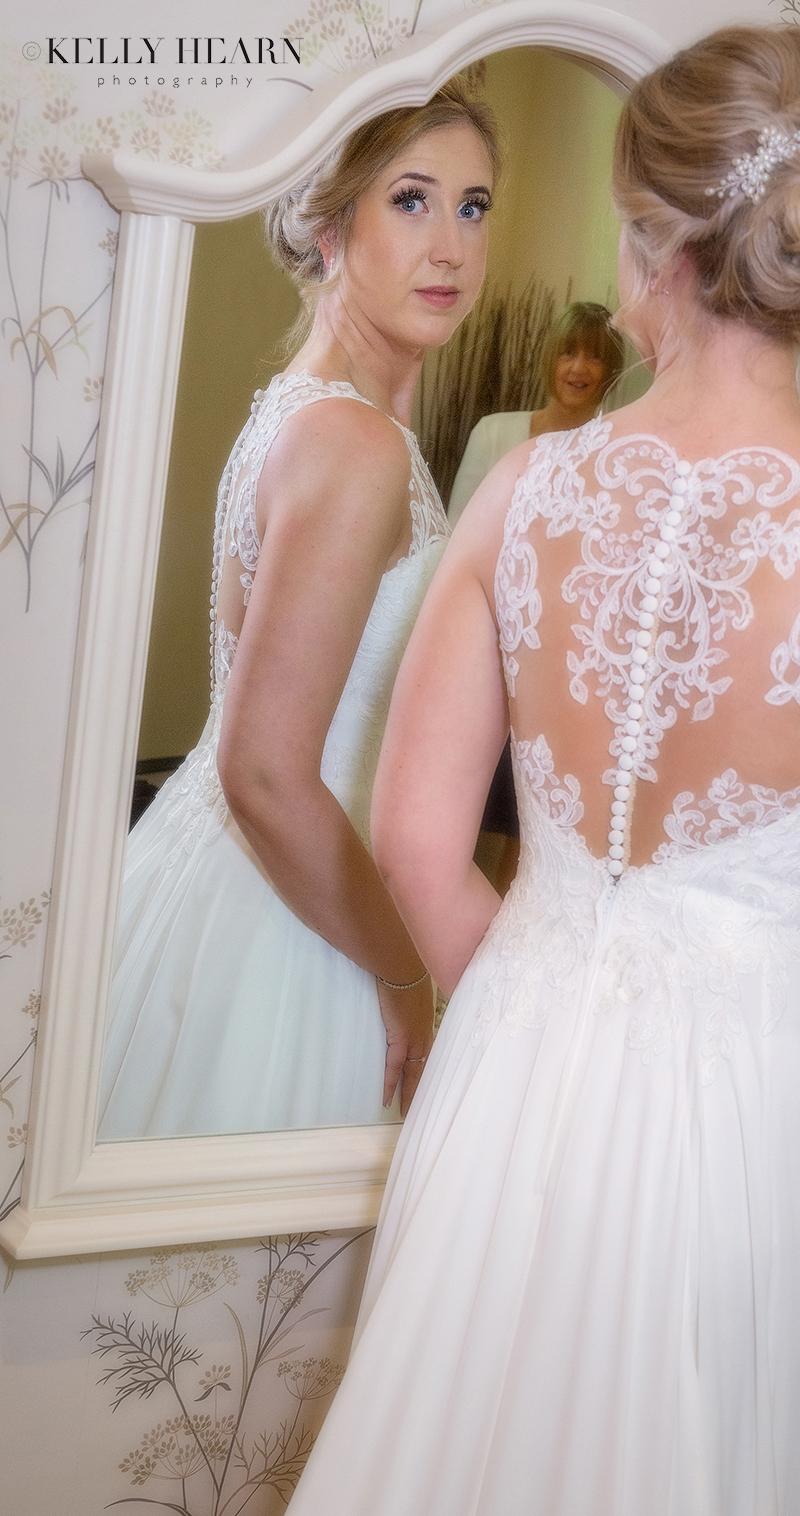 PAG_bridal-portrait-mirror.jpg#asset:2619